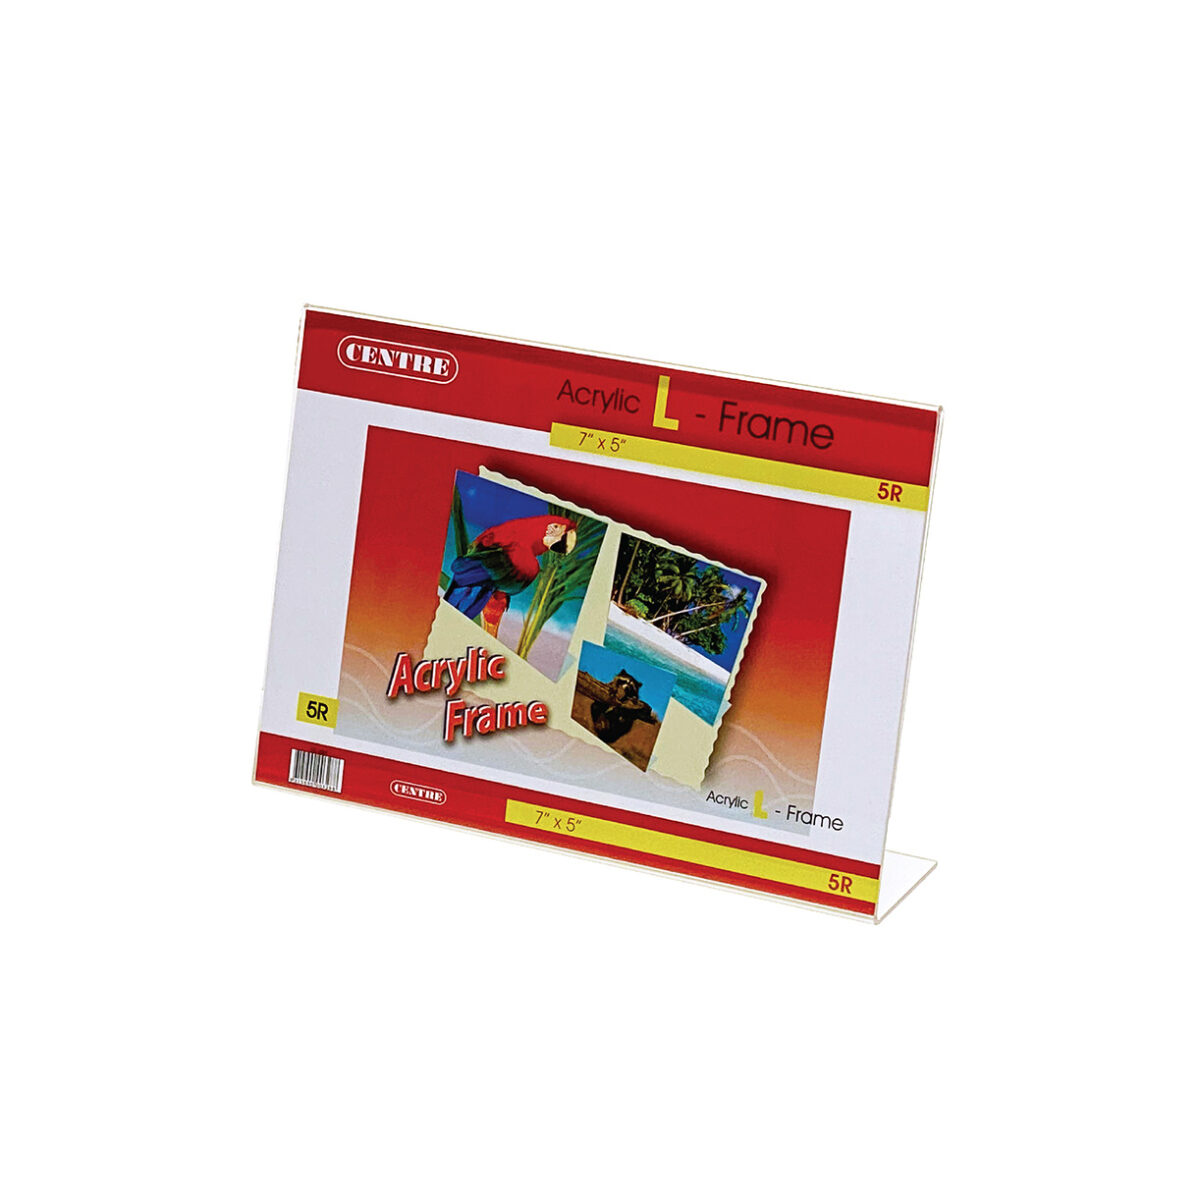 Centre Acrylic Picture Frame - L Stand Landscape 5R